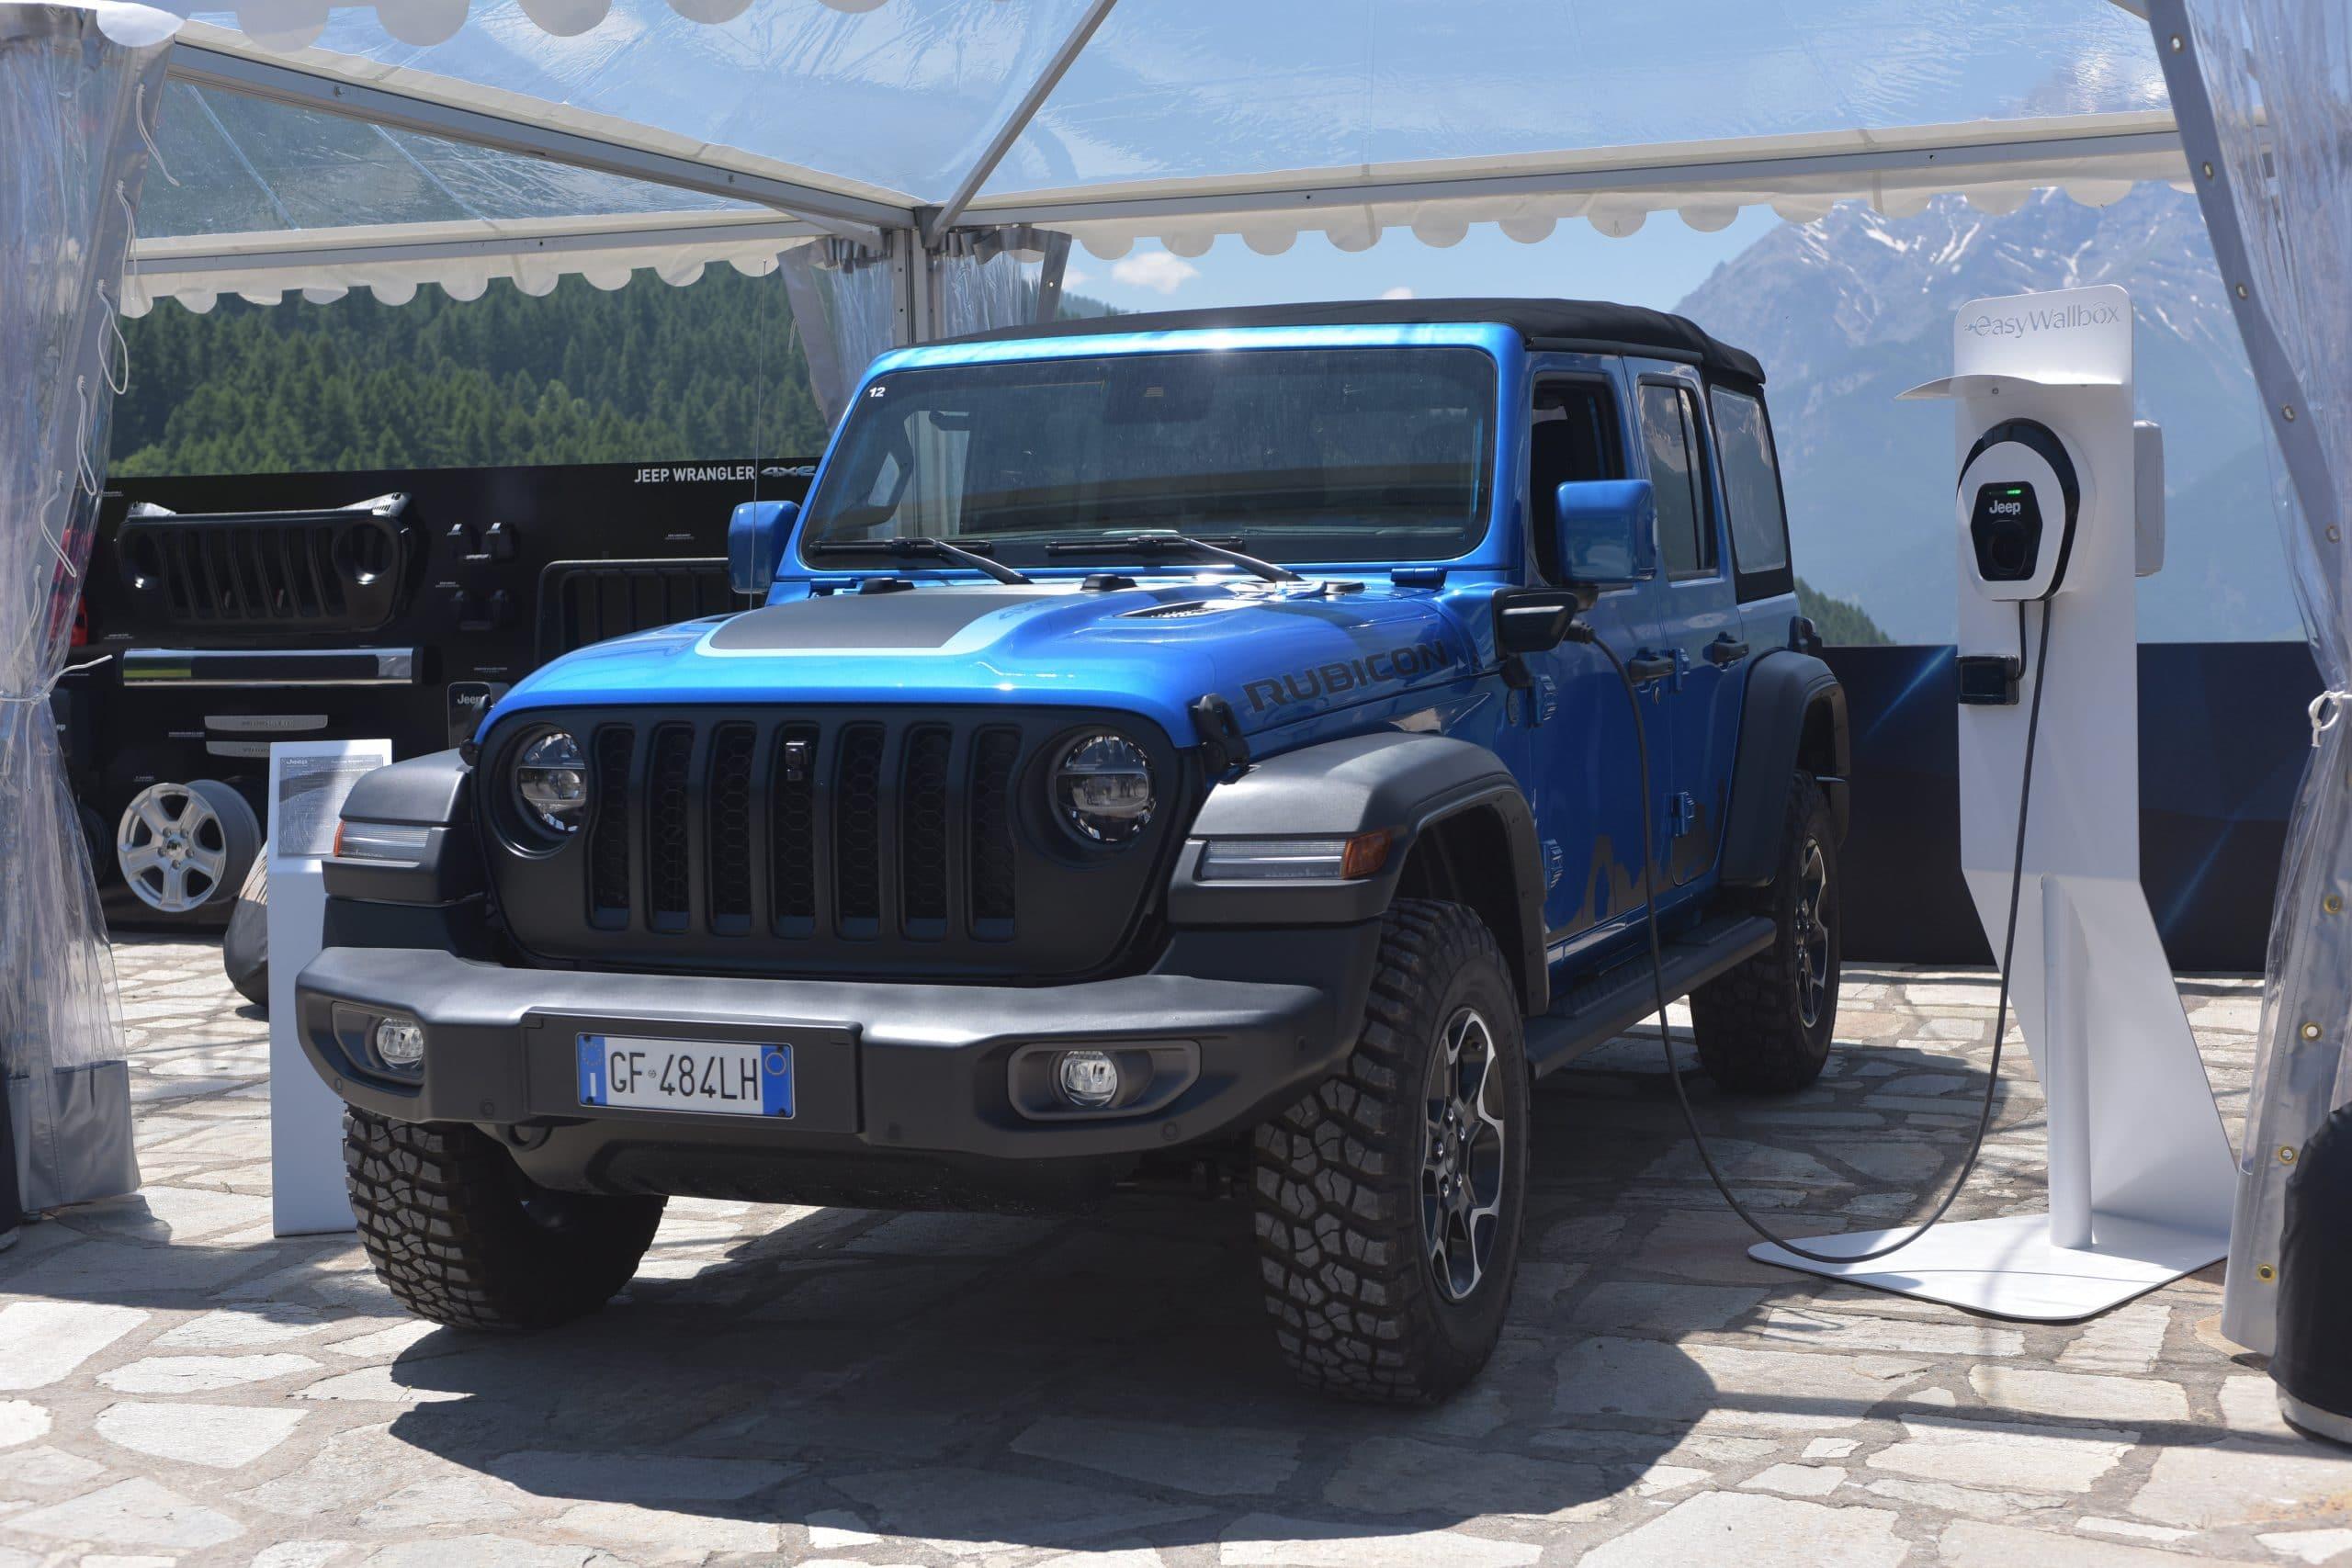 01 HP Jeep Wrangler 4xe scaled Νέα σειρά αξεσουάρ για το Plug-in Hybrid, Jeep Wrangler 4xe Jeep, Jeep 4XE, Mopar, Wrangler, Wrangler 4XE, ειδήσεις, Νέα